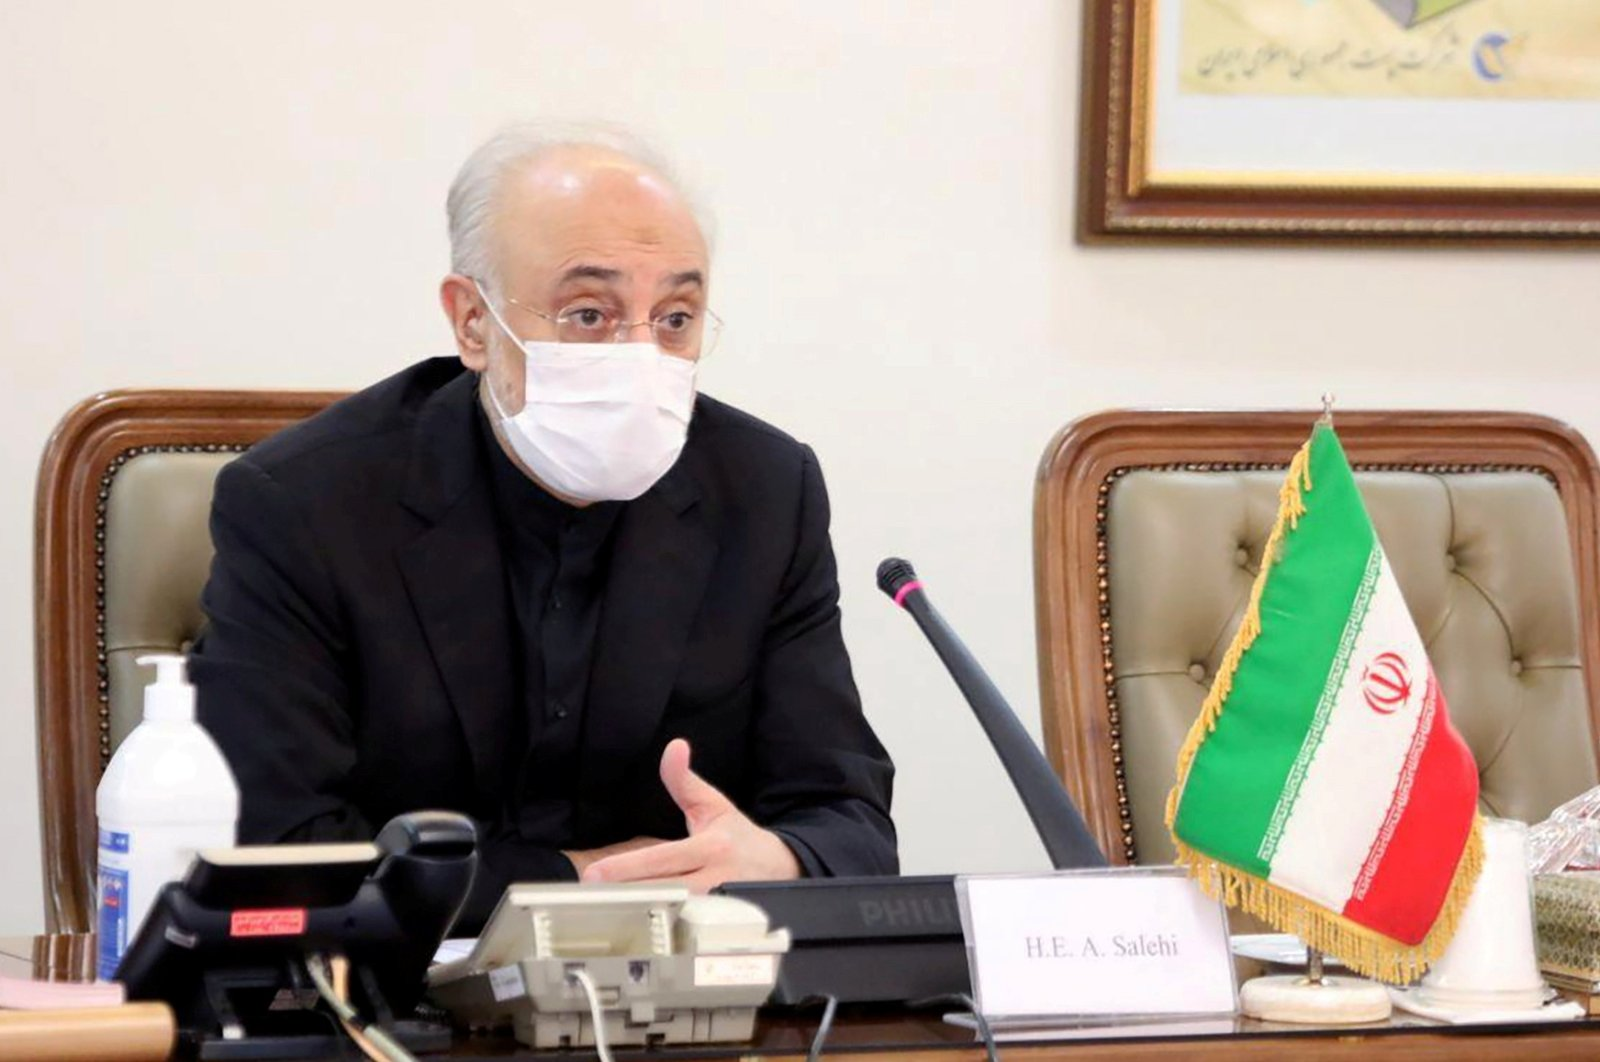 Head of Iran's Atomic Energy Organization Ali-Akbar Salehi wears a mask as he speaks during a meeting with International Atomic Energy Agency (IAEA) Director General Rafael Grossi, in Tehran, Iran, August 25, 2020. (Reuters Photo)